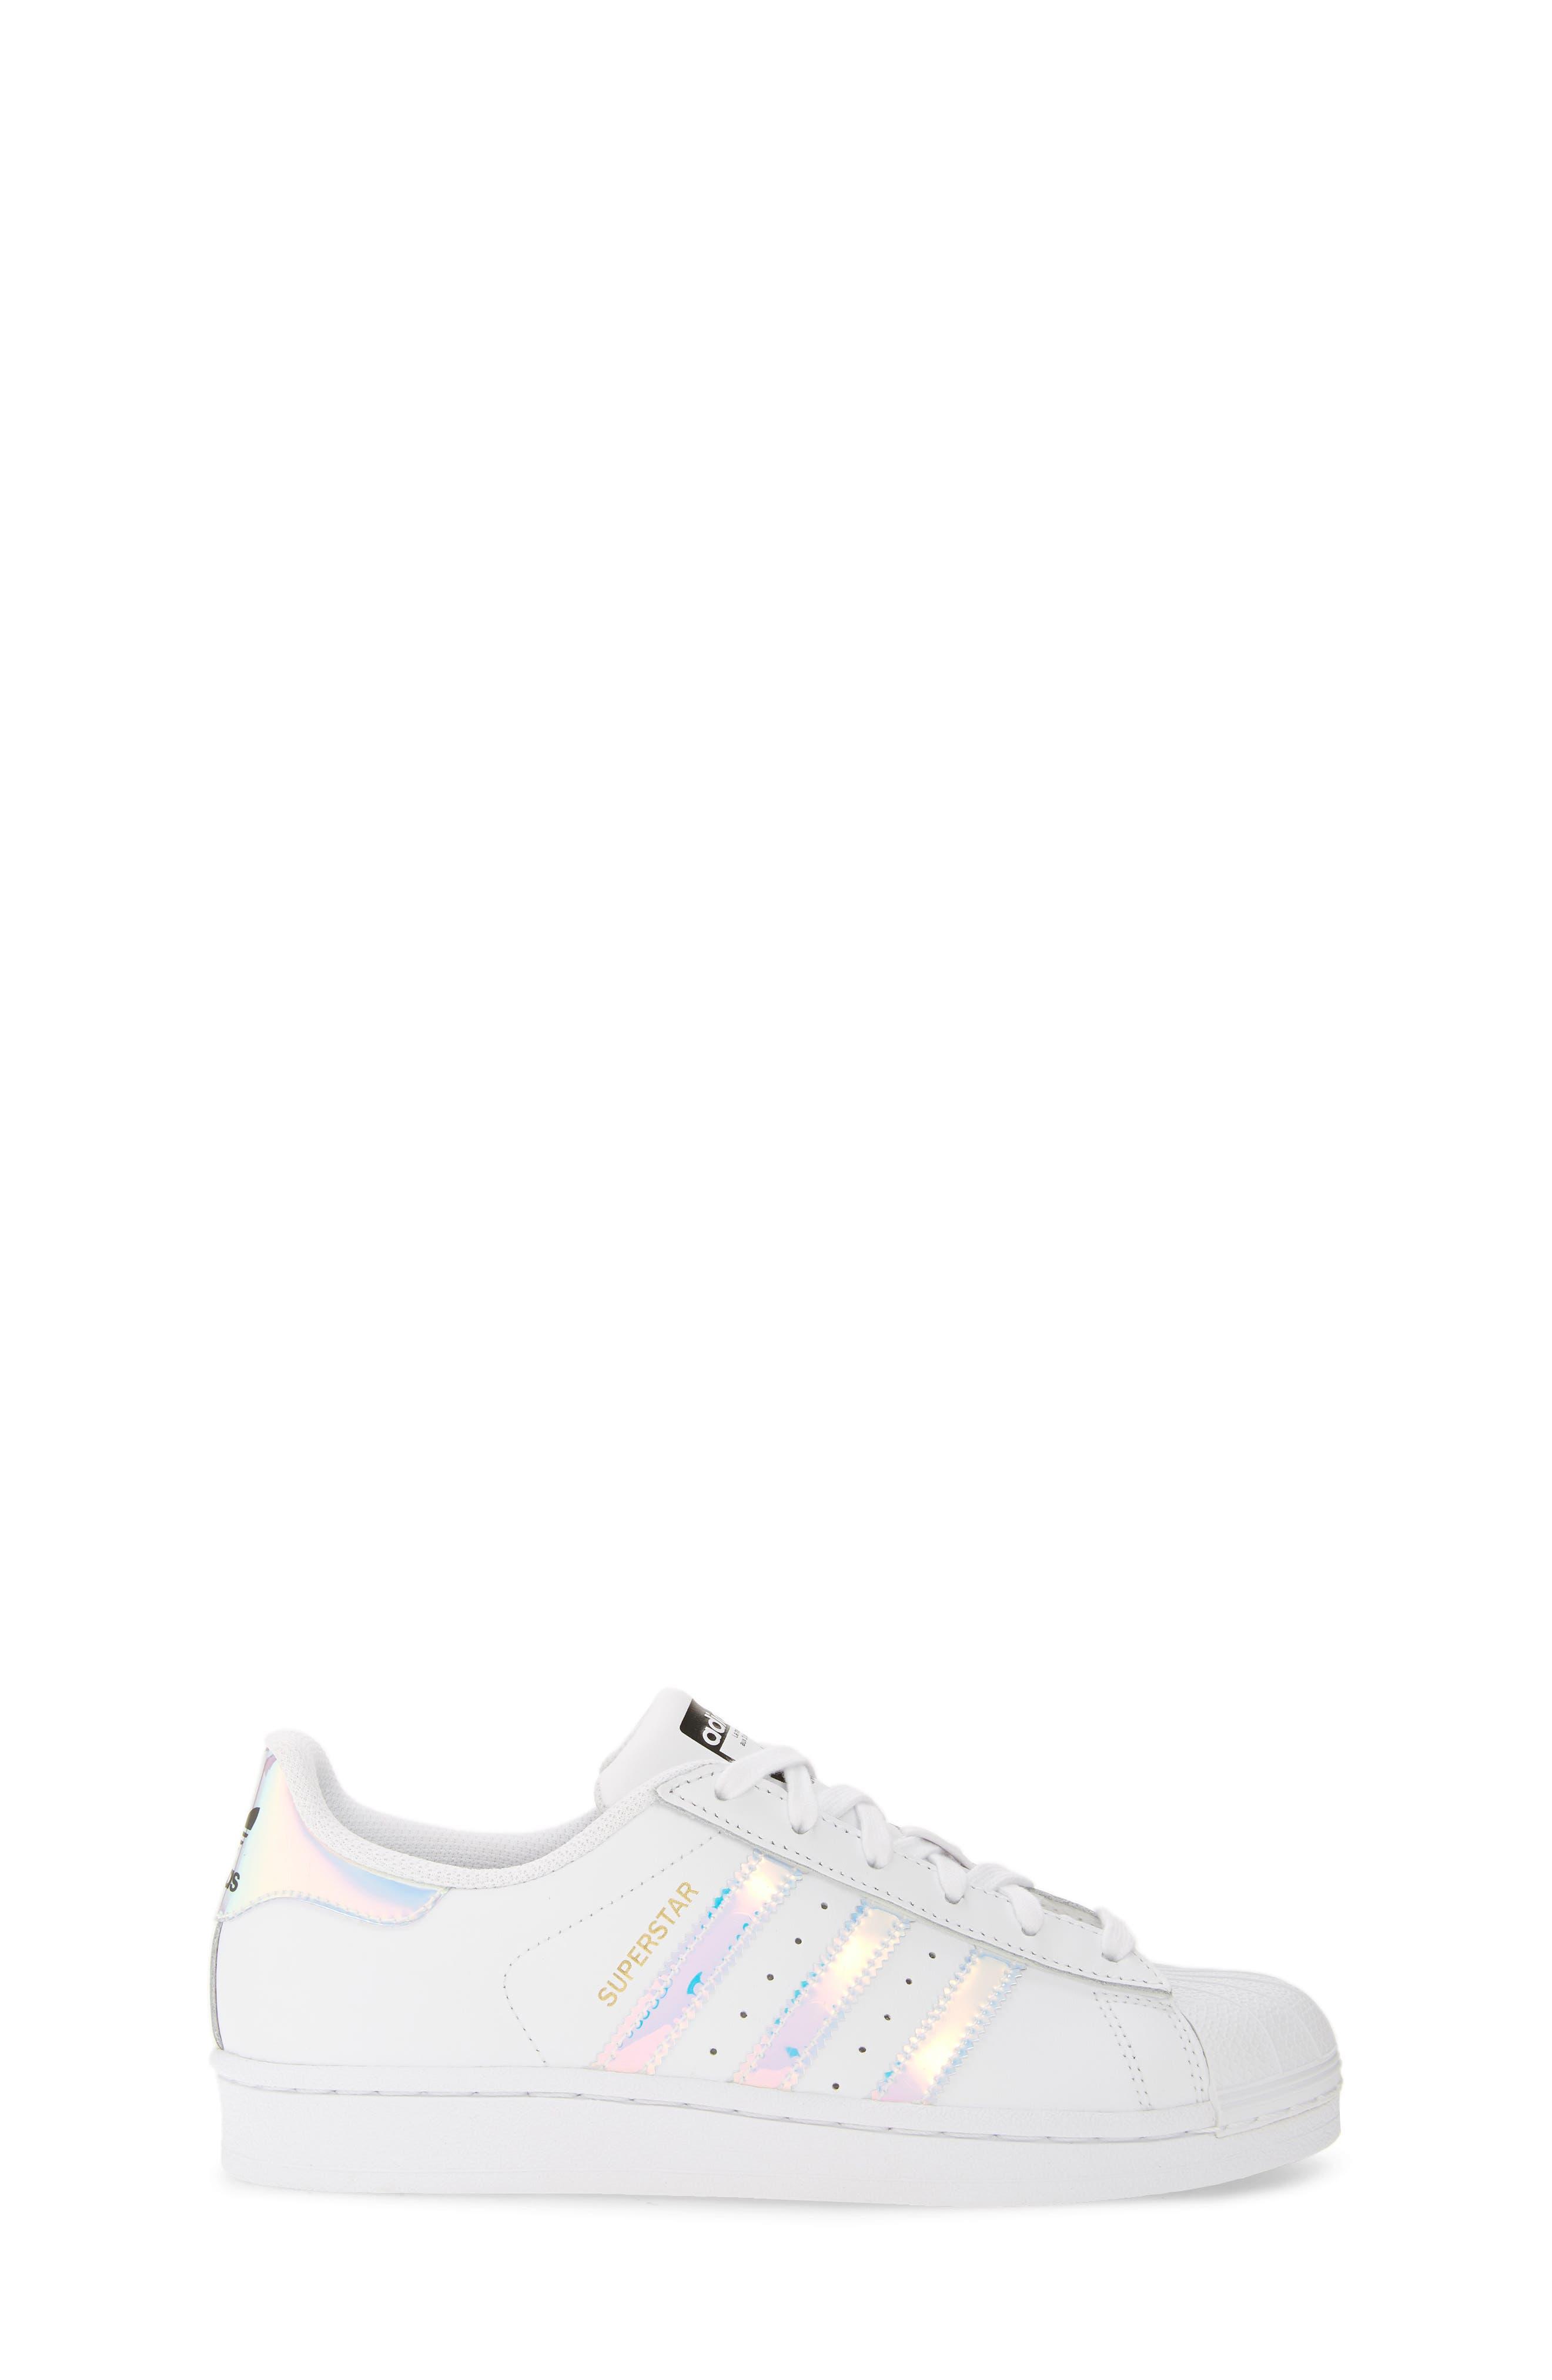 Superstar - Iridescent Sneaker,                             Alternate thumbnail 4, color,                             SILVER METALLIC/ WHITE